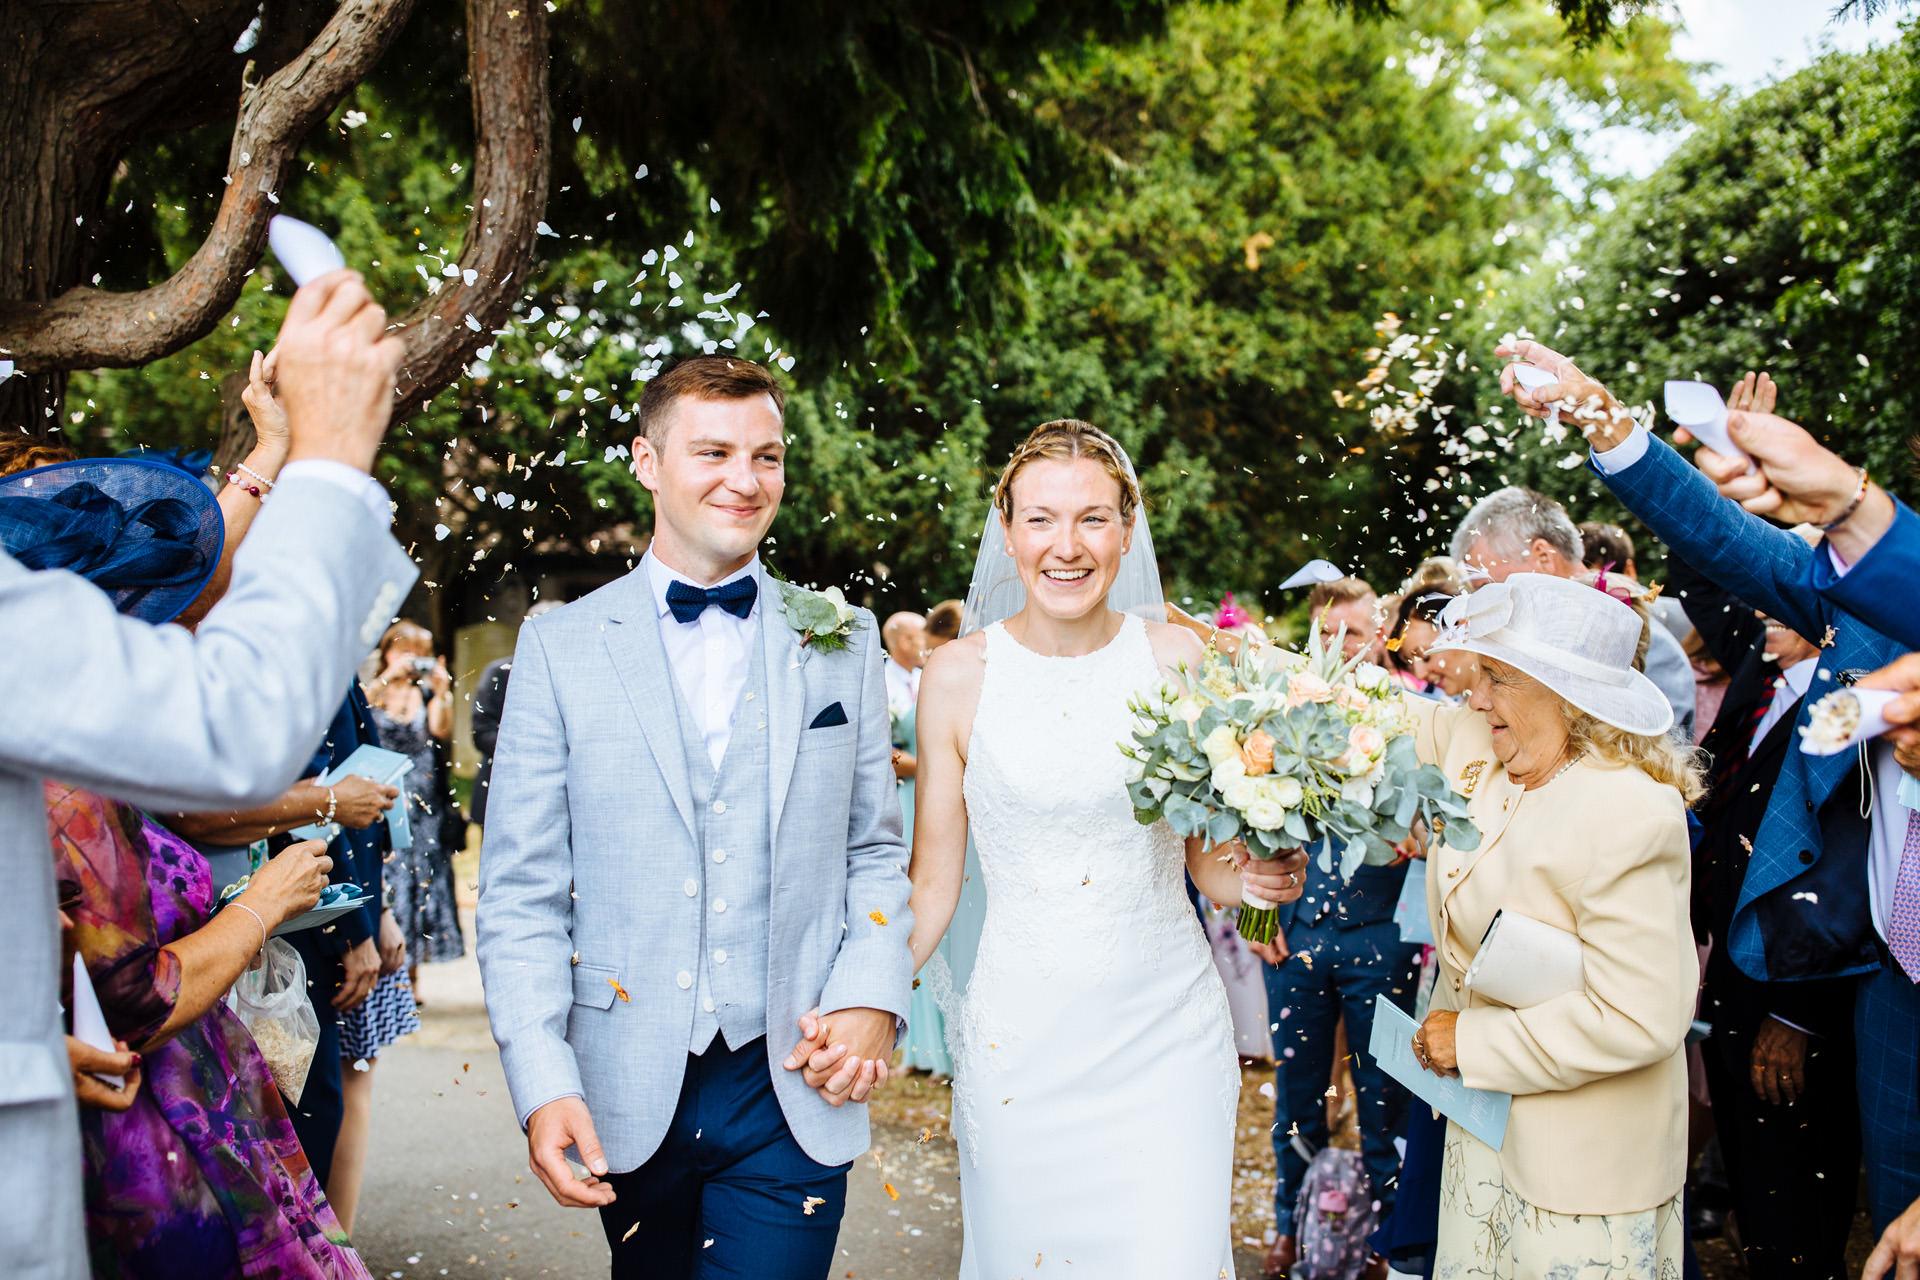 everyone throwing confetti on bride and groom at kentfield farm wedding